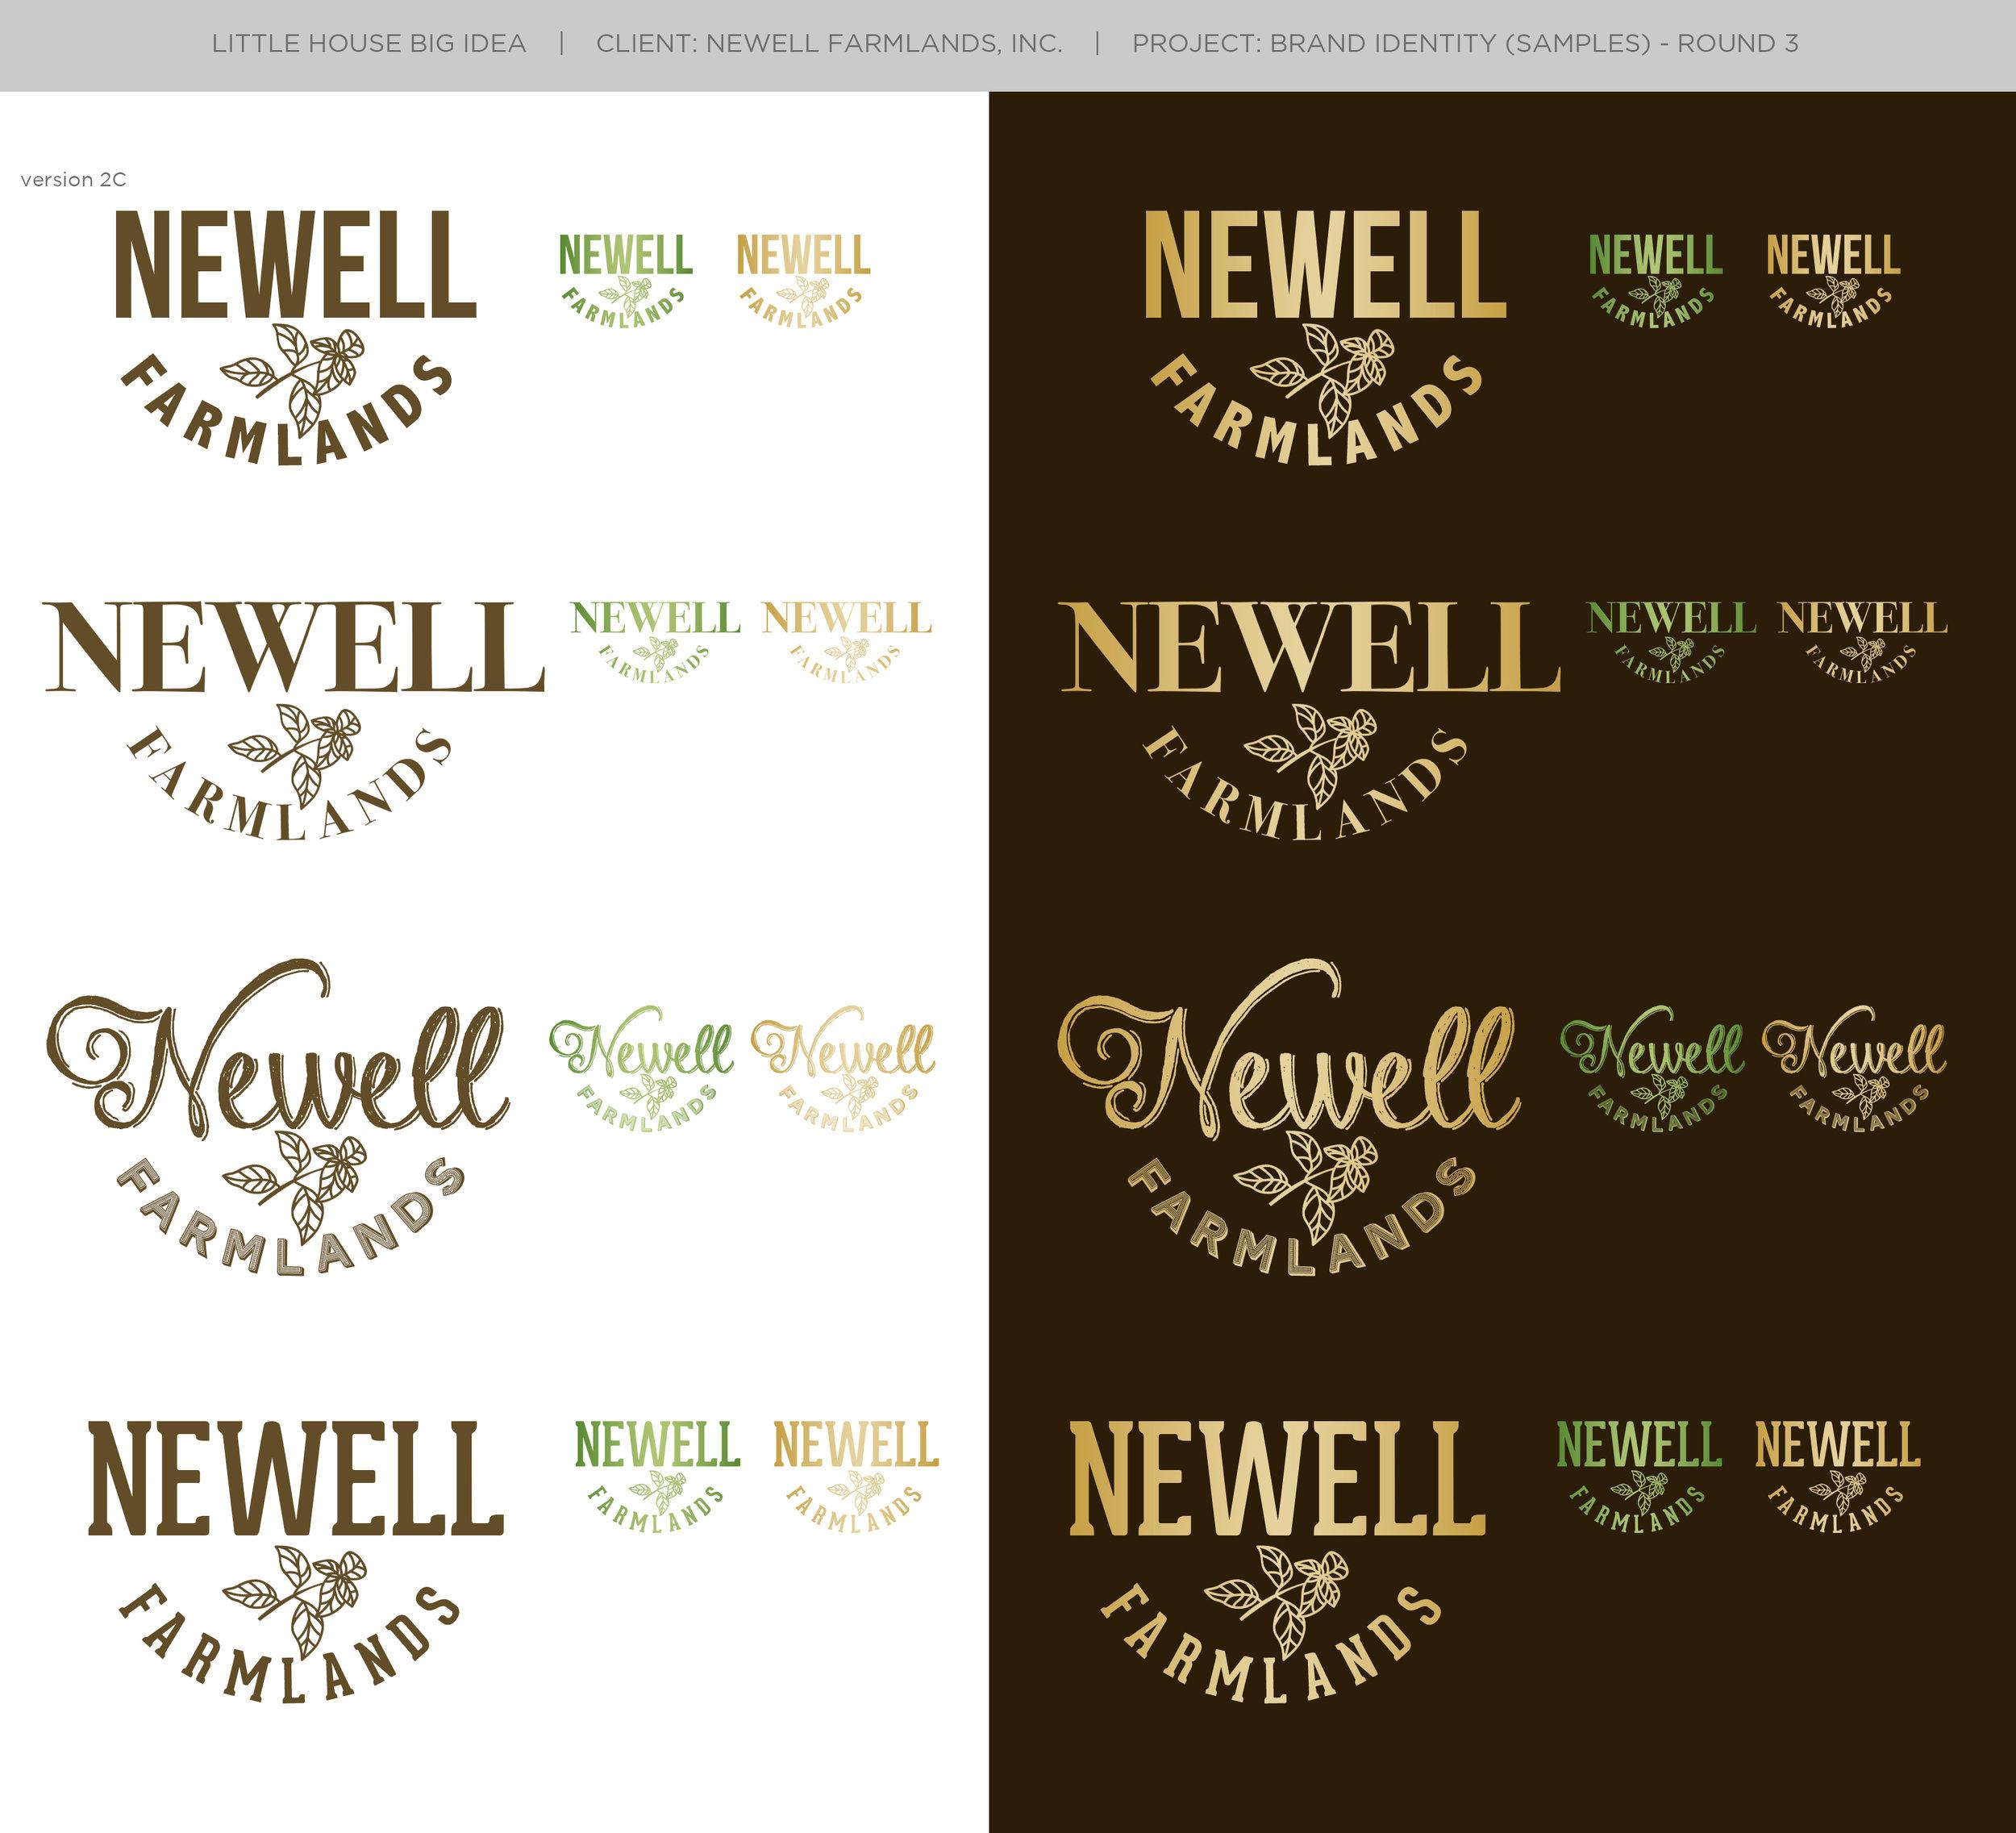 LHBI_NewellFarmlands_LogoSamples_Round3_02.01.17.jpg